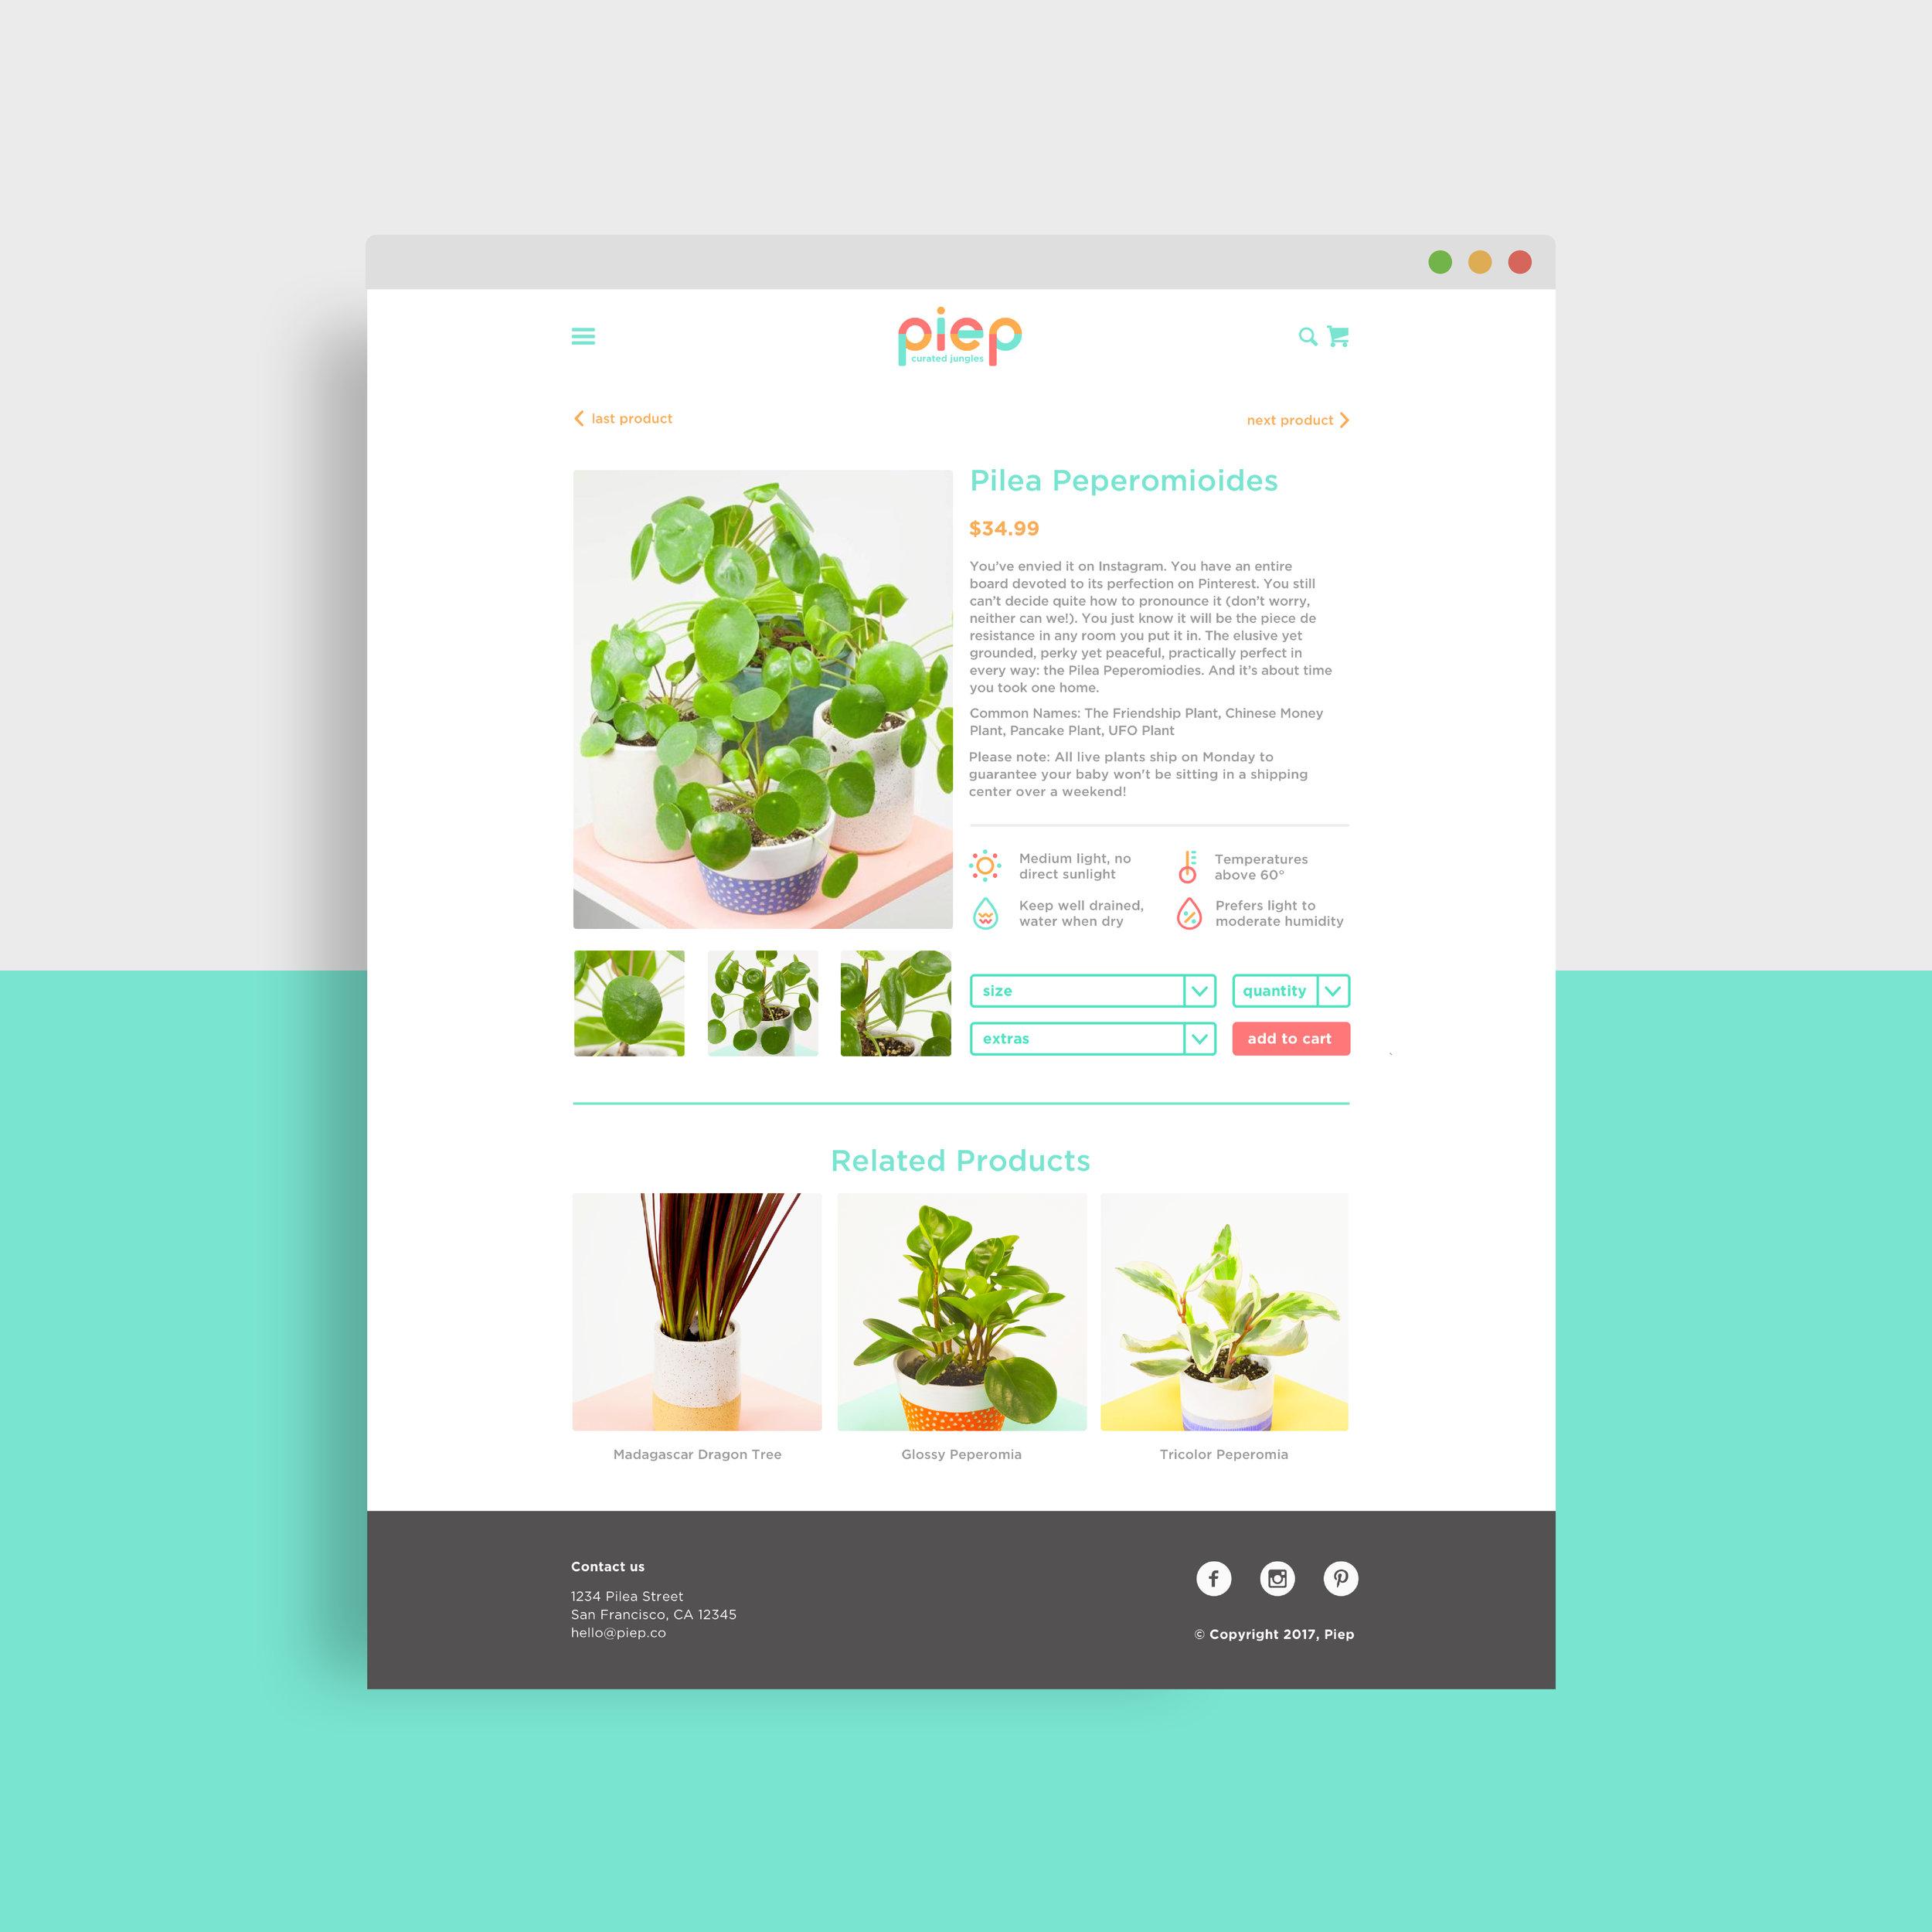 Shanti-Sparrow_piep_work_ecommerce page.jpg